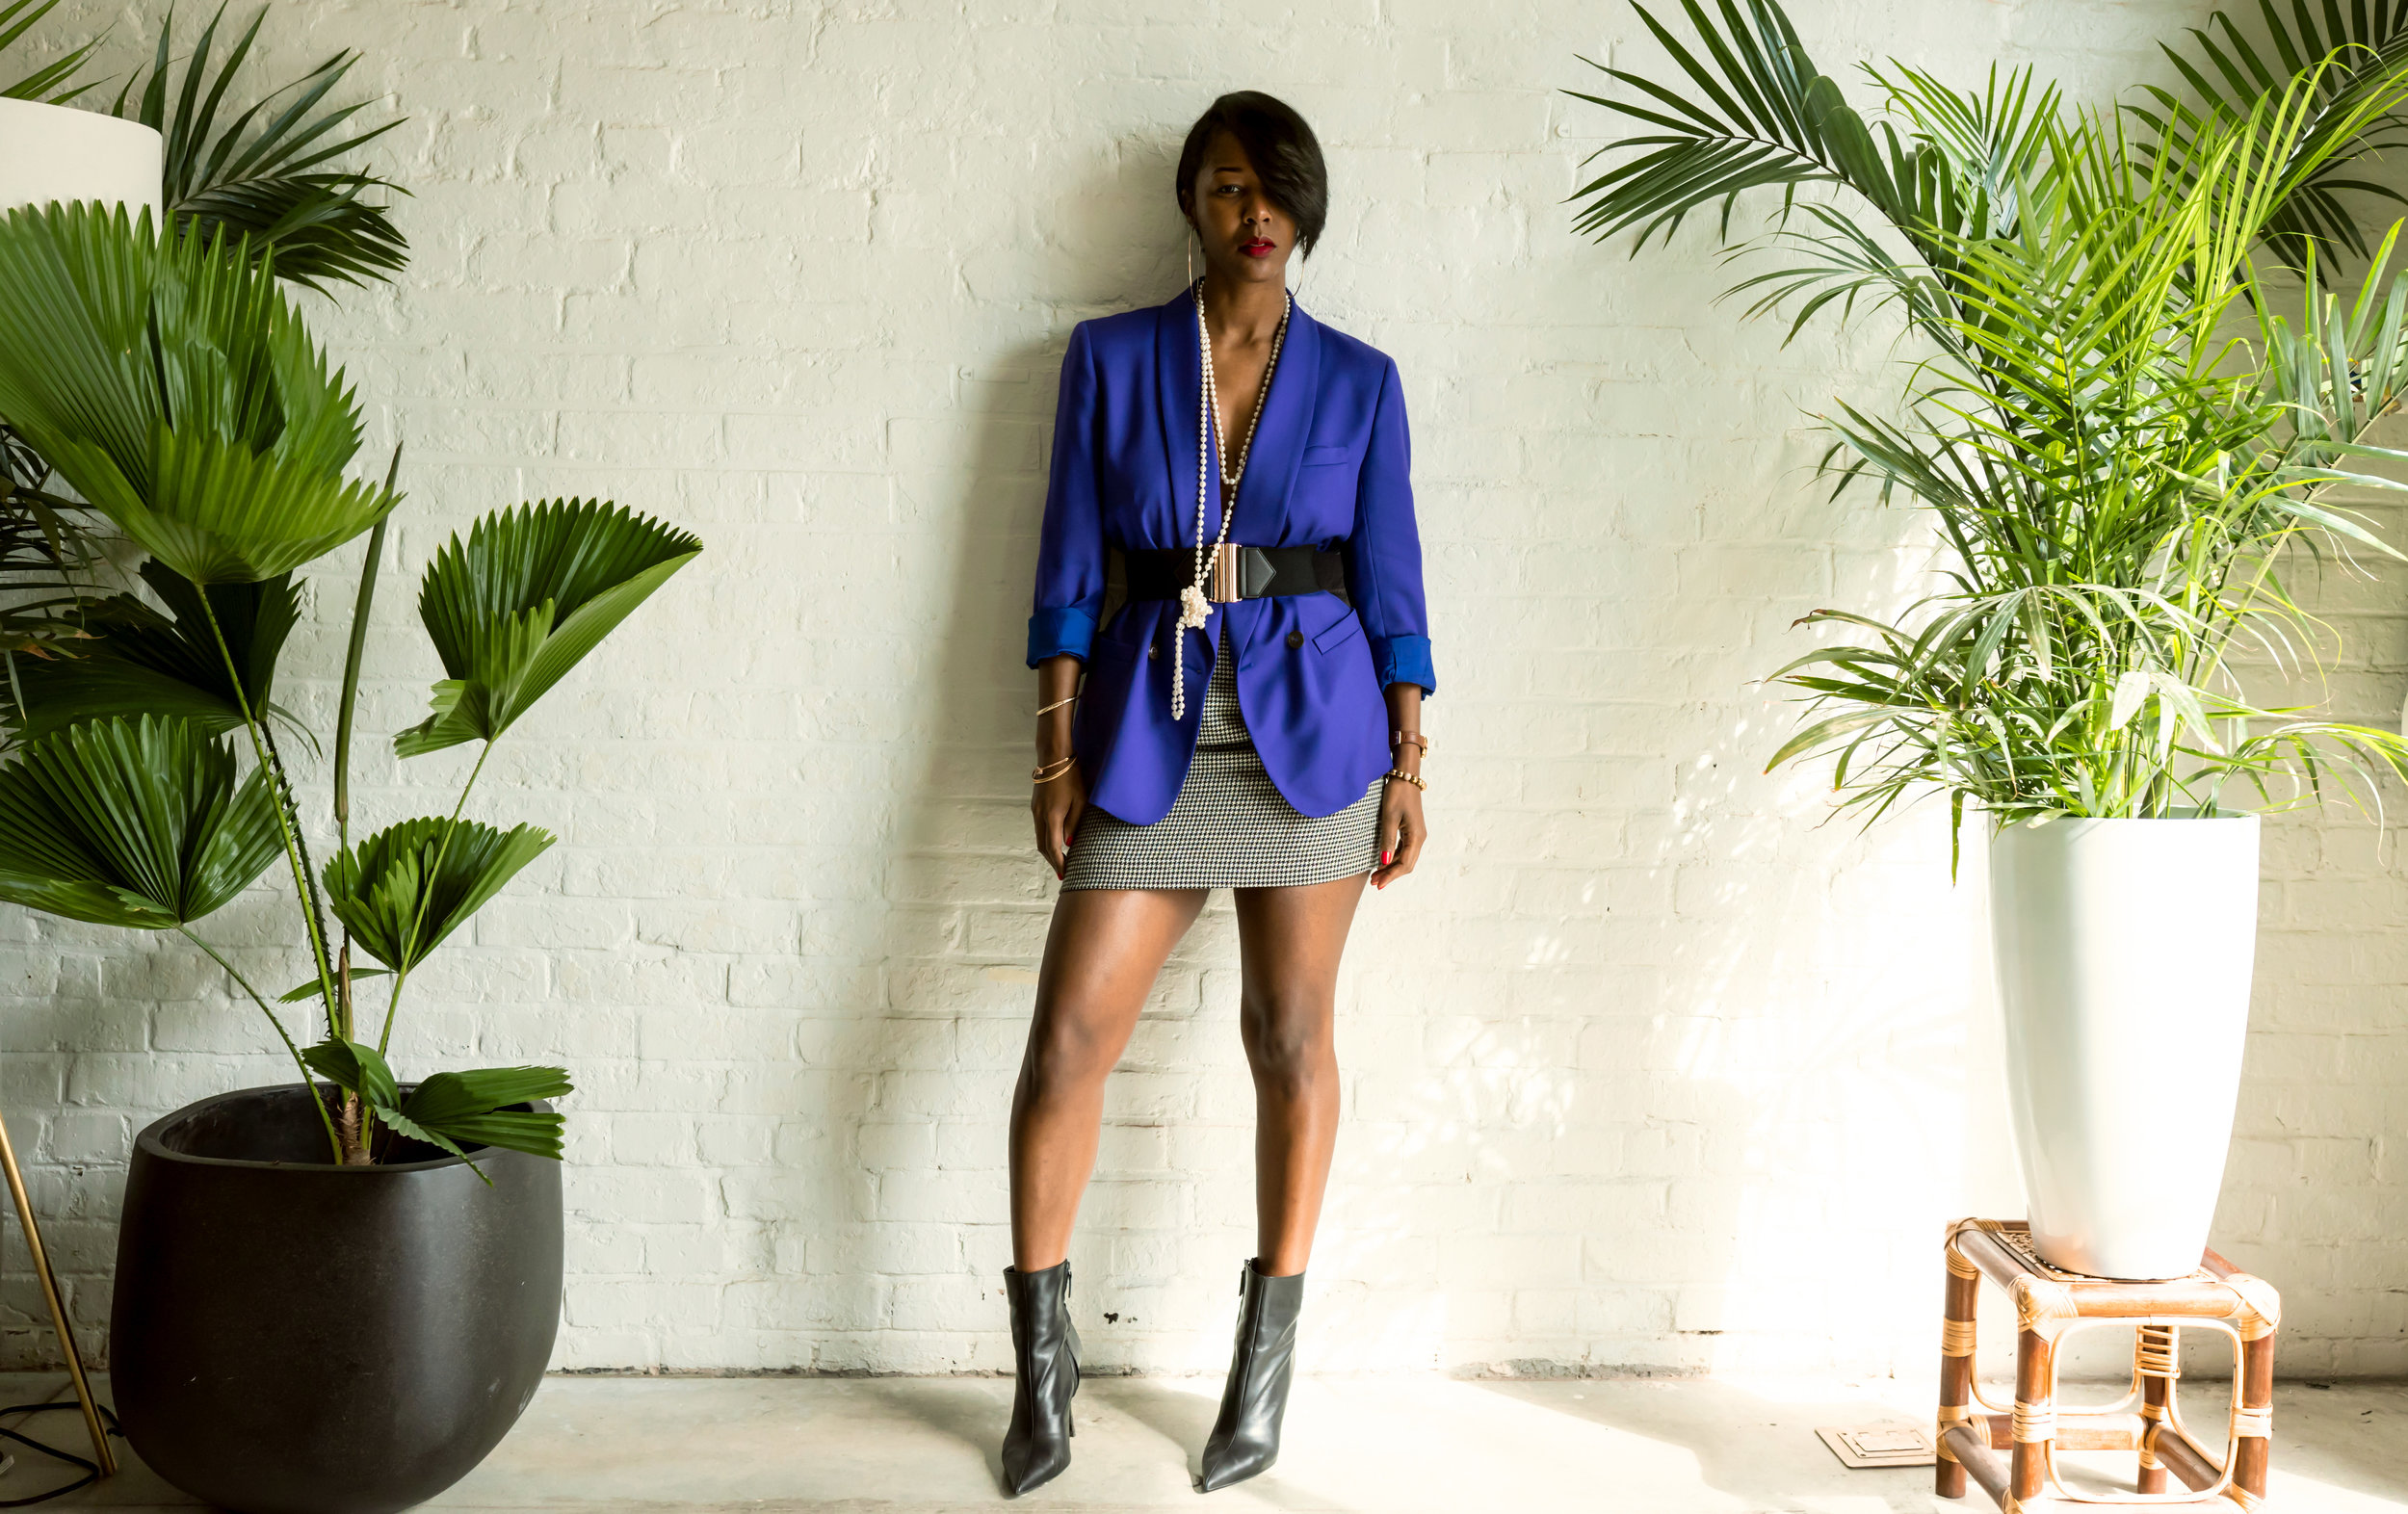 Vintage Purple Blazer and Vintage Houndstooth Skirt